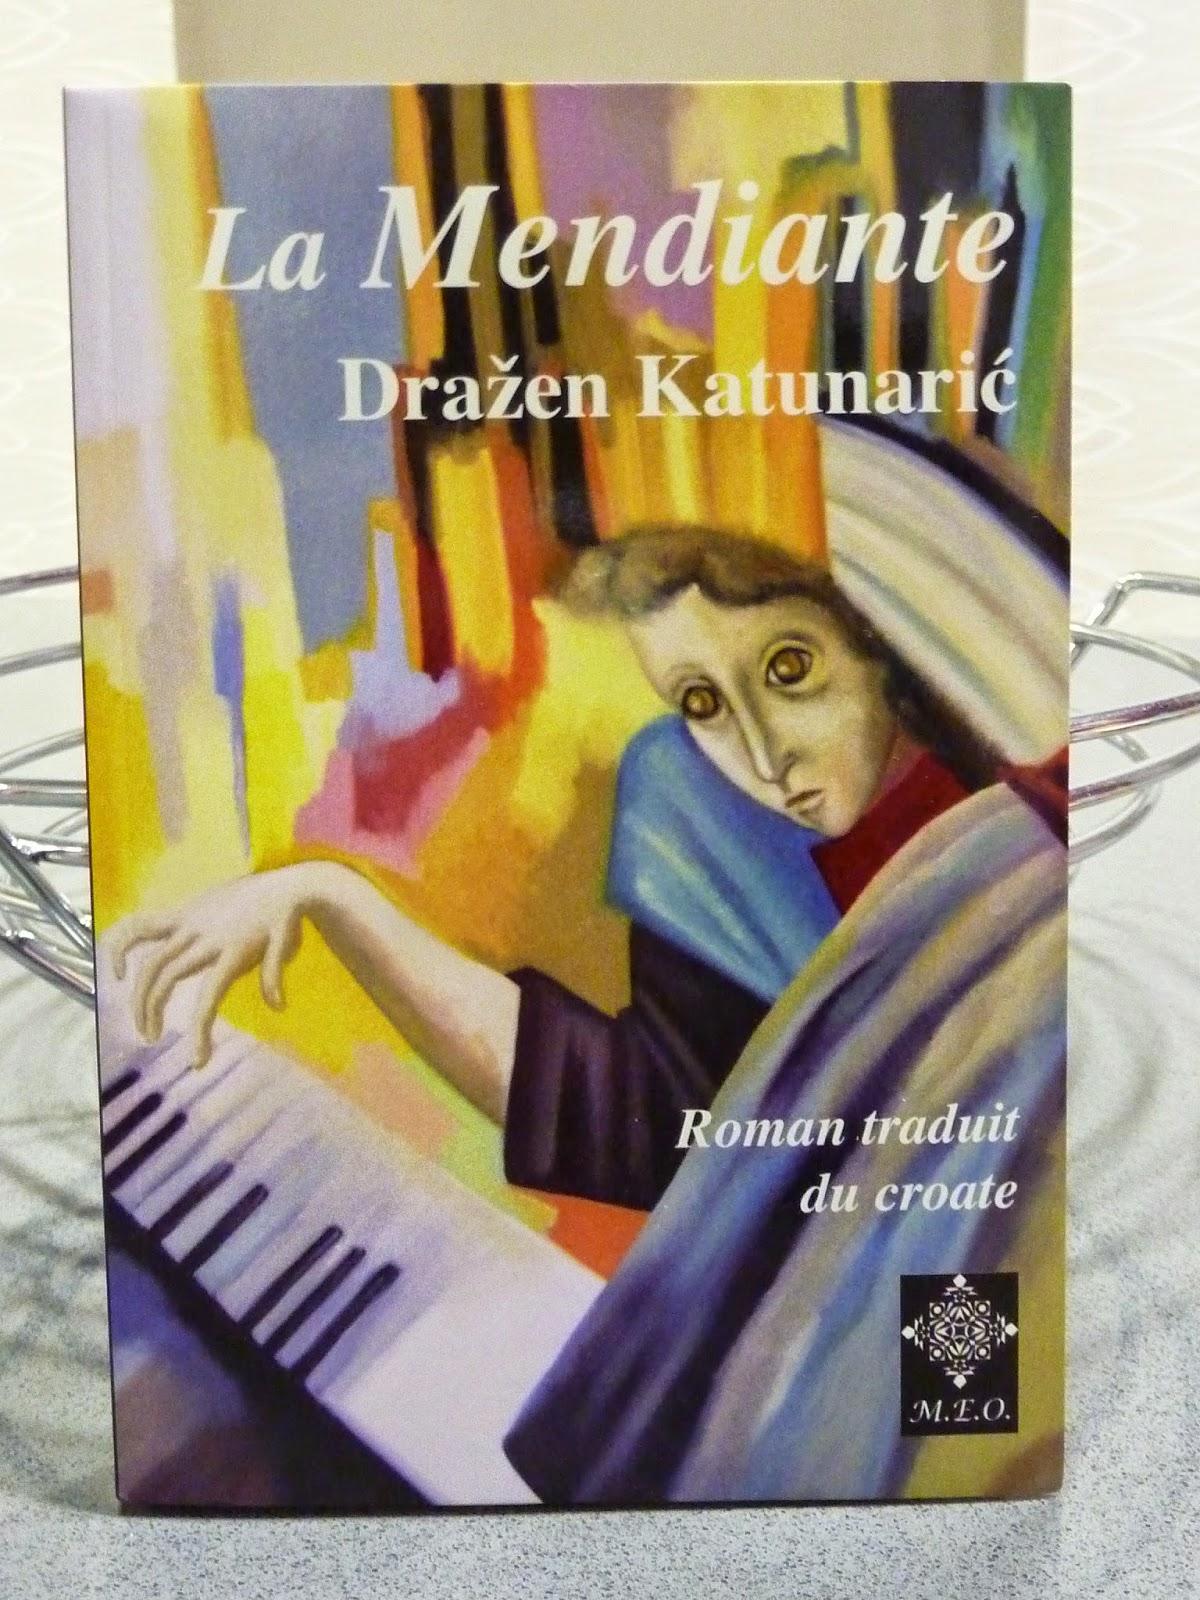 La mendiante - Drazen Katunaric